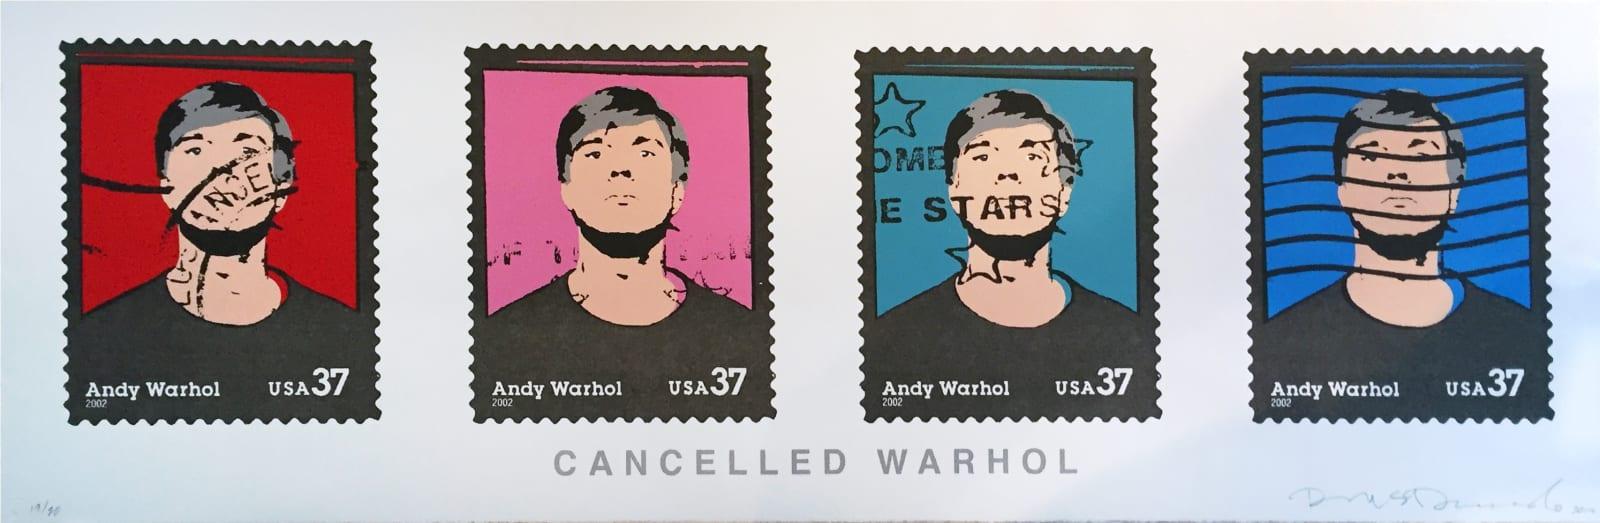 Richard Duardo, Cancelled Warhol, 2014